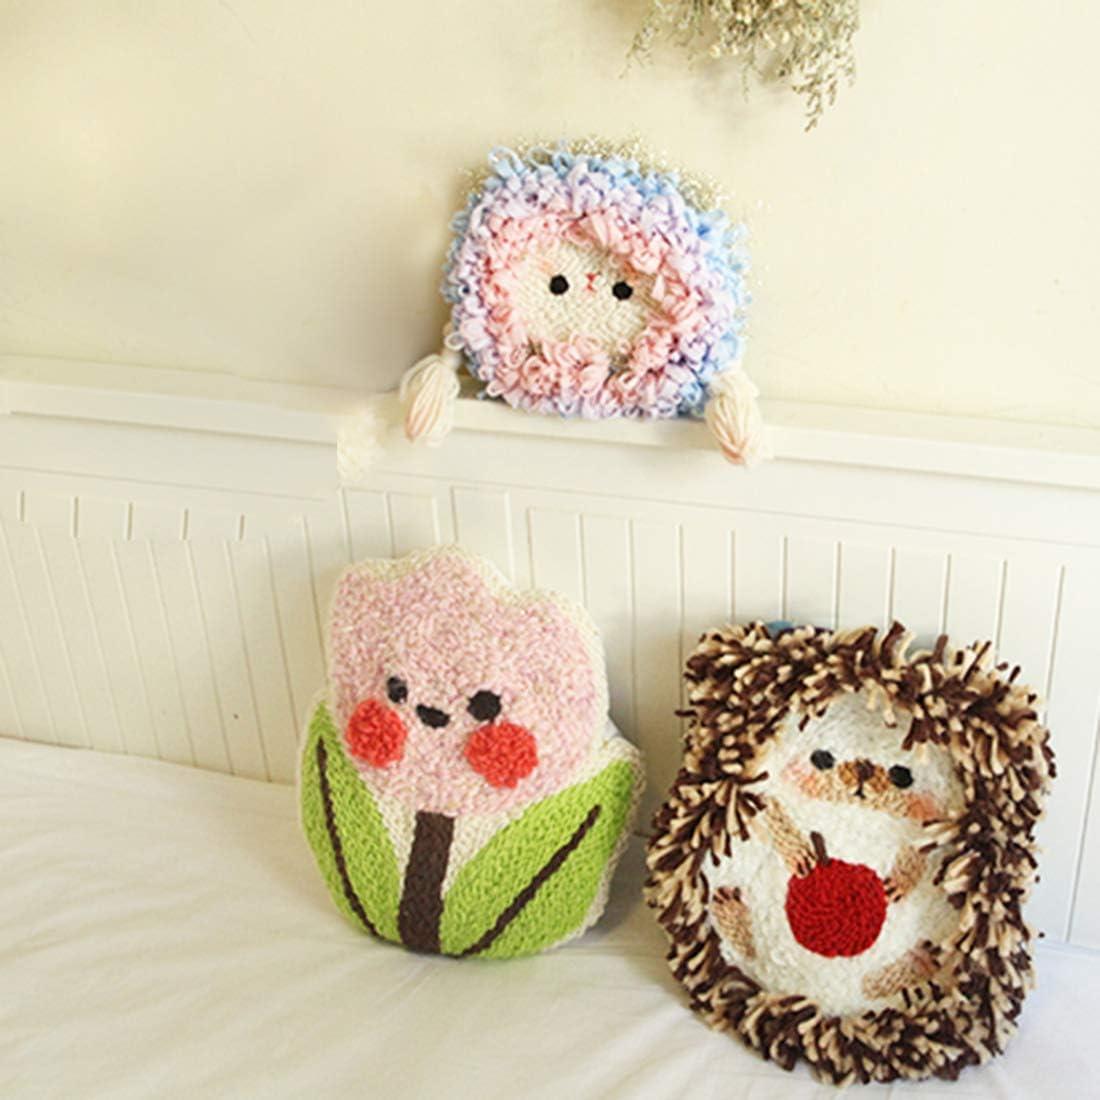 XSHION Flower Small Pillow Latch Hook Kit for Kids DIY Handcraft Punch Needle Starter Kit Woolen Embroidery Rug Hooking Kit for Bedroom Kids Room,Gift for Girls